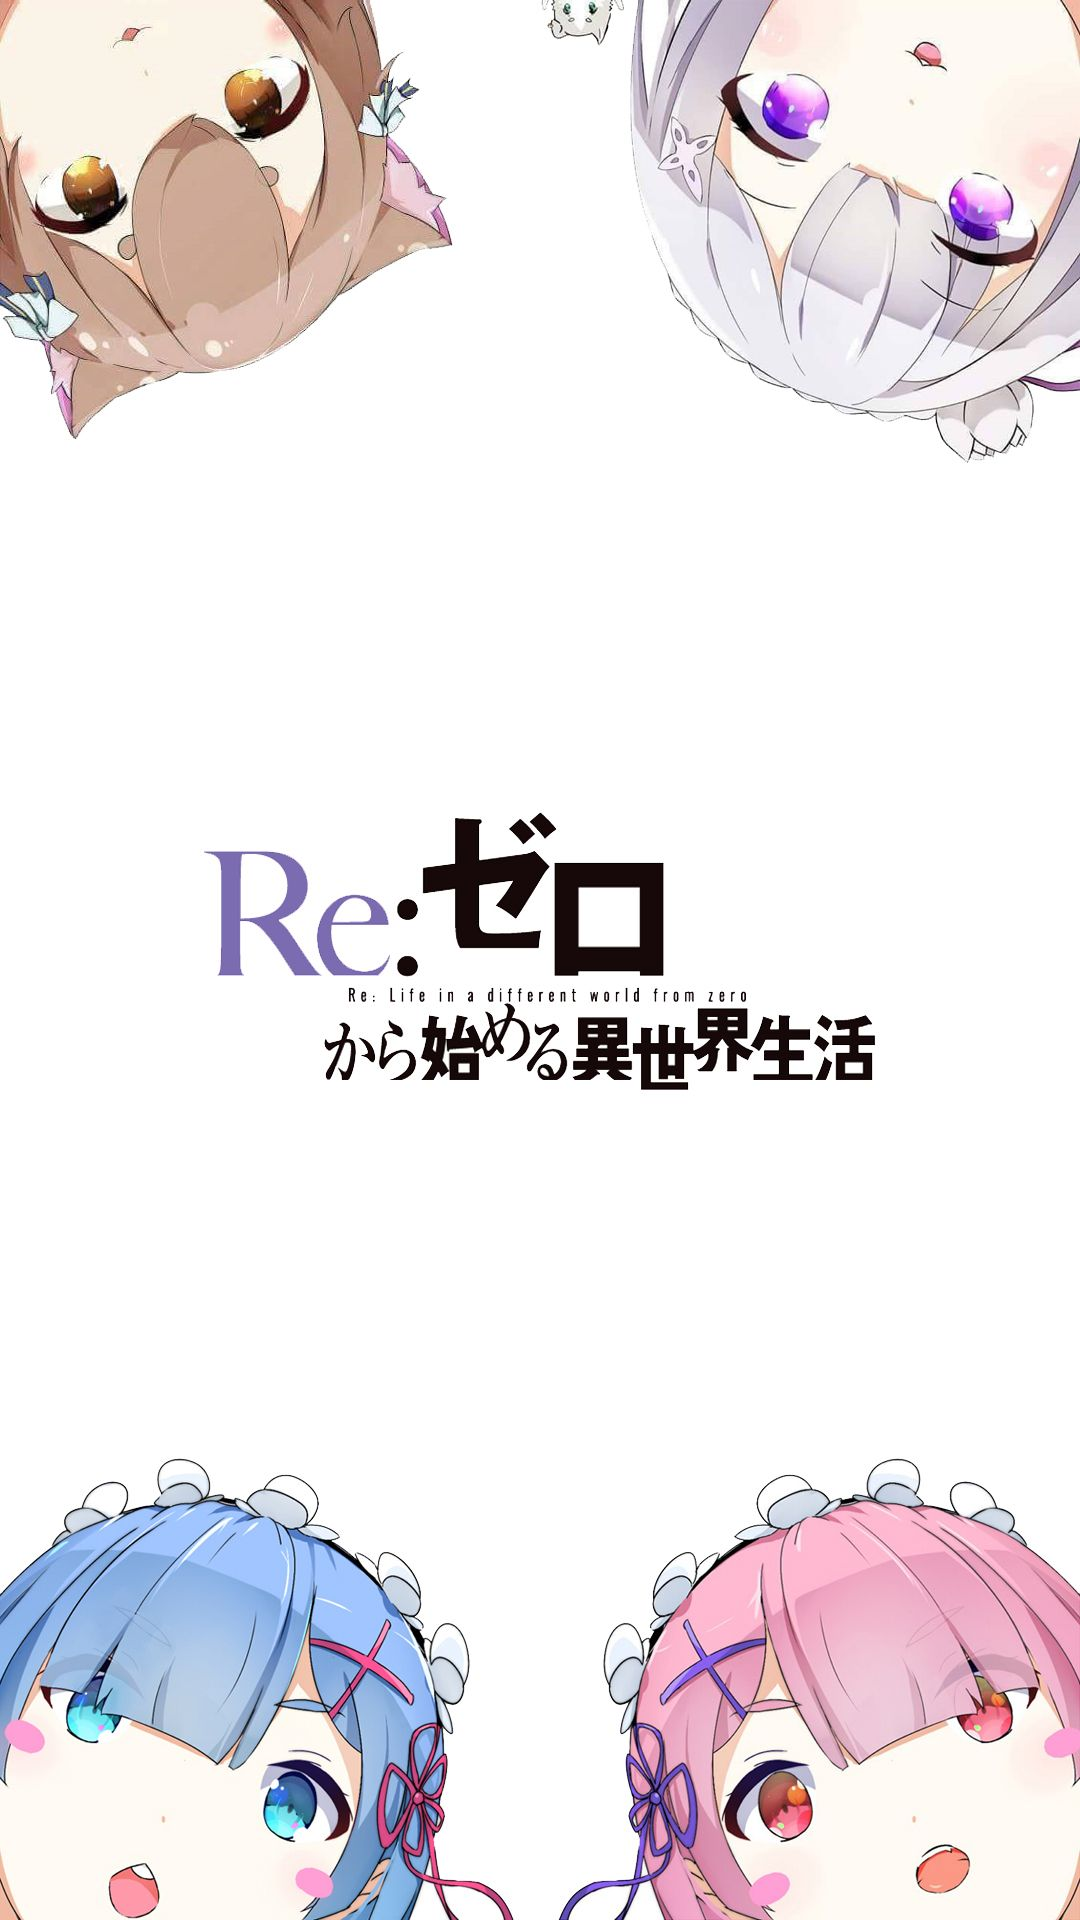 Re: zero wallpaper (with logo)